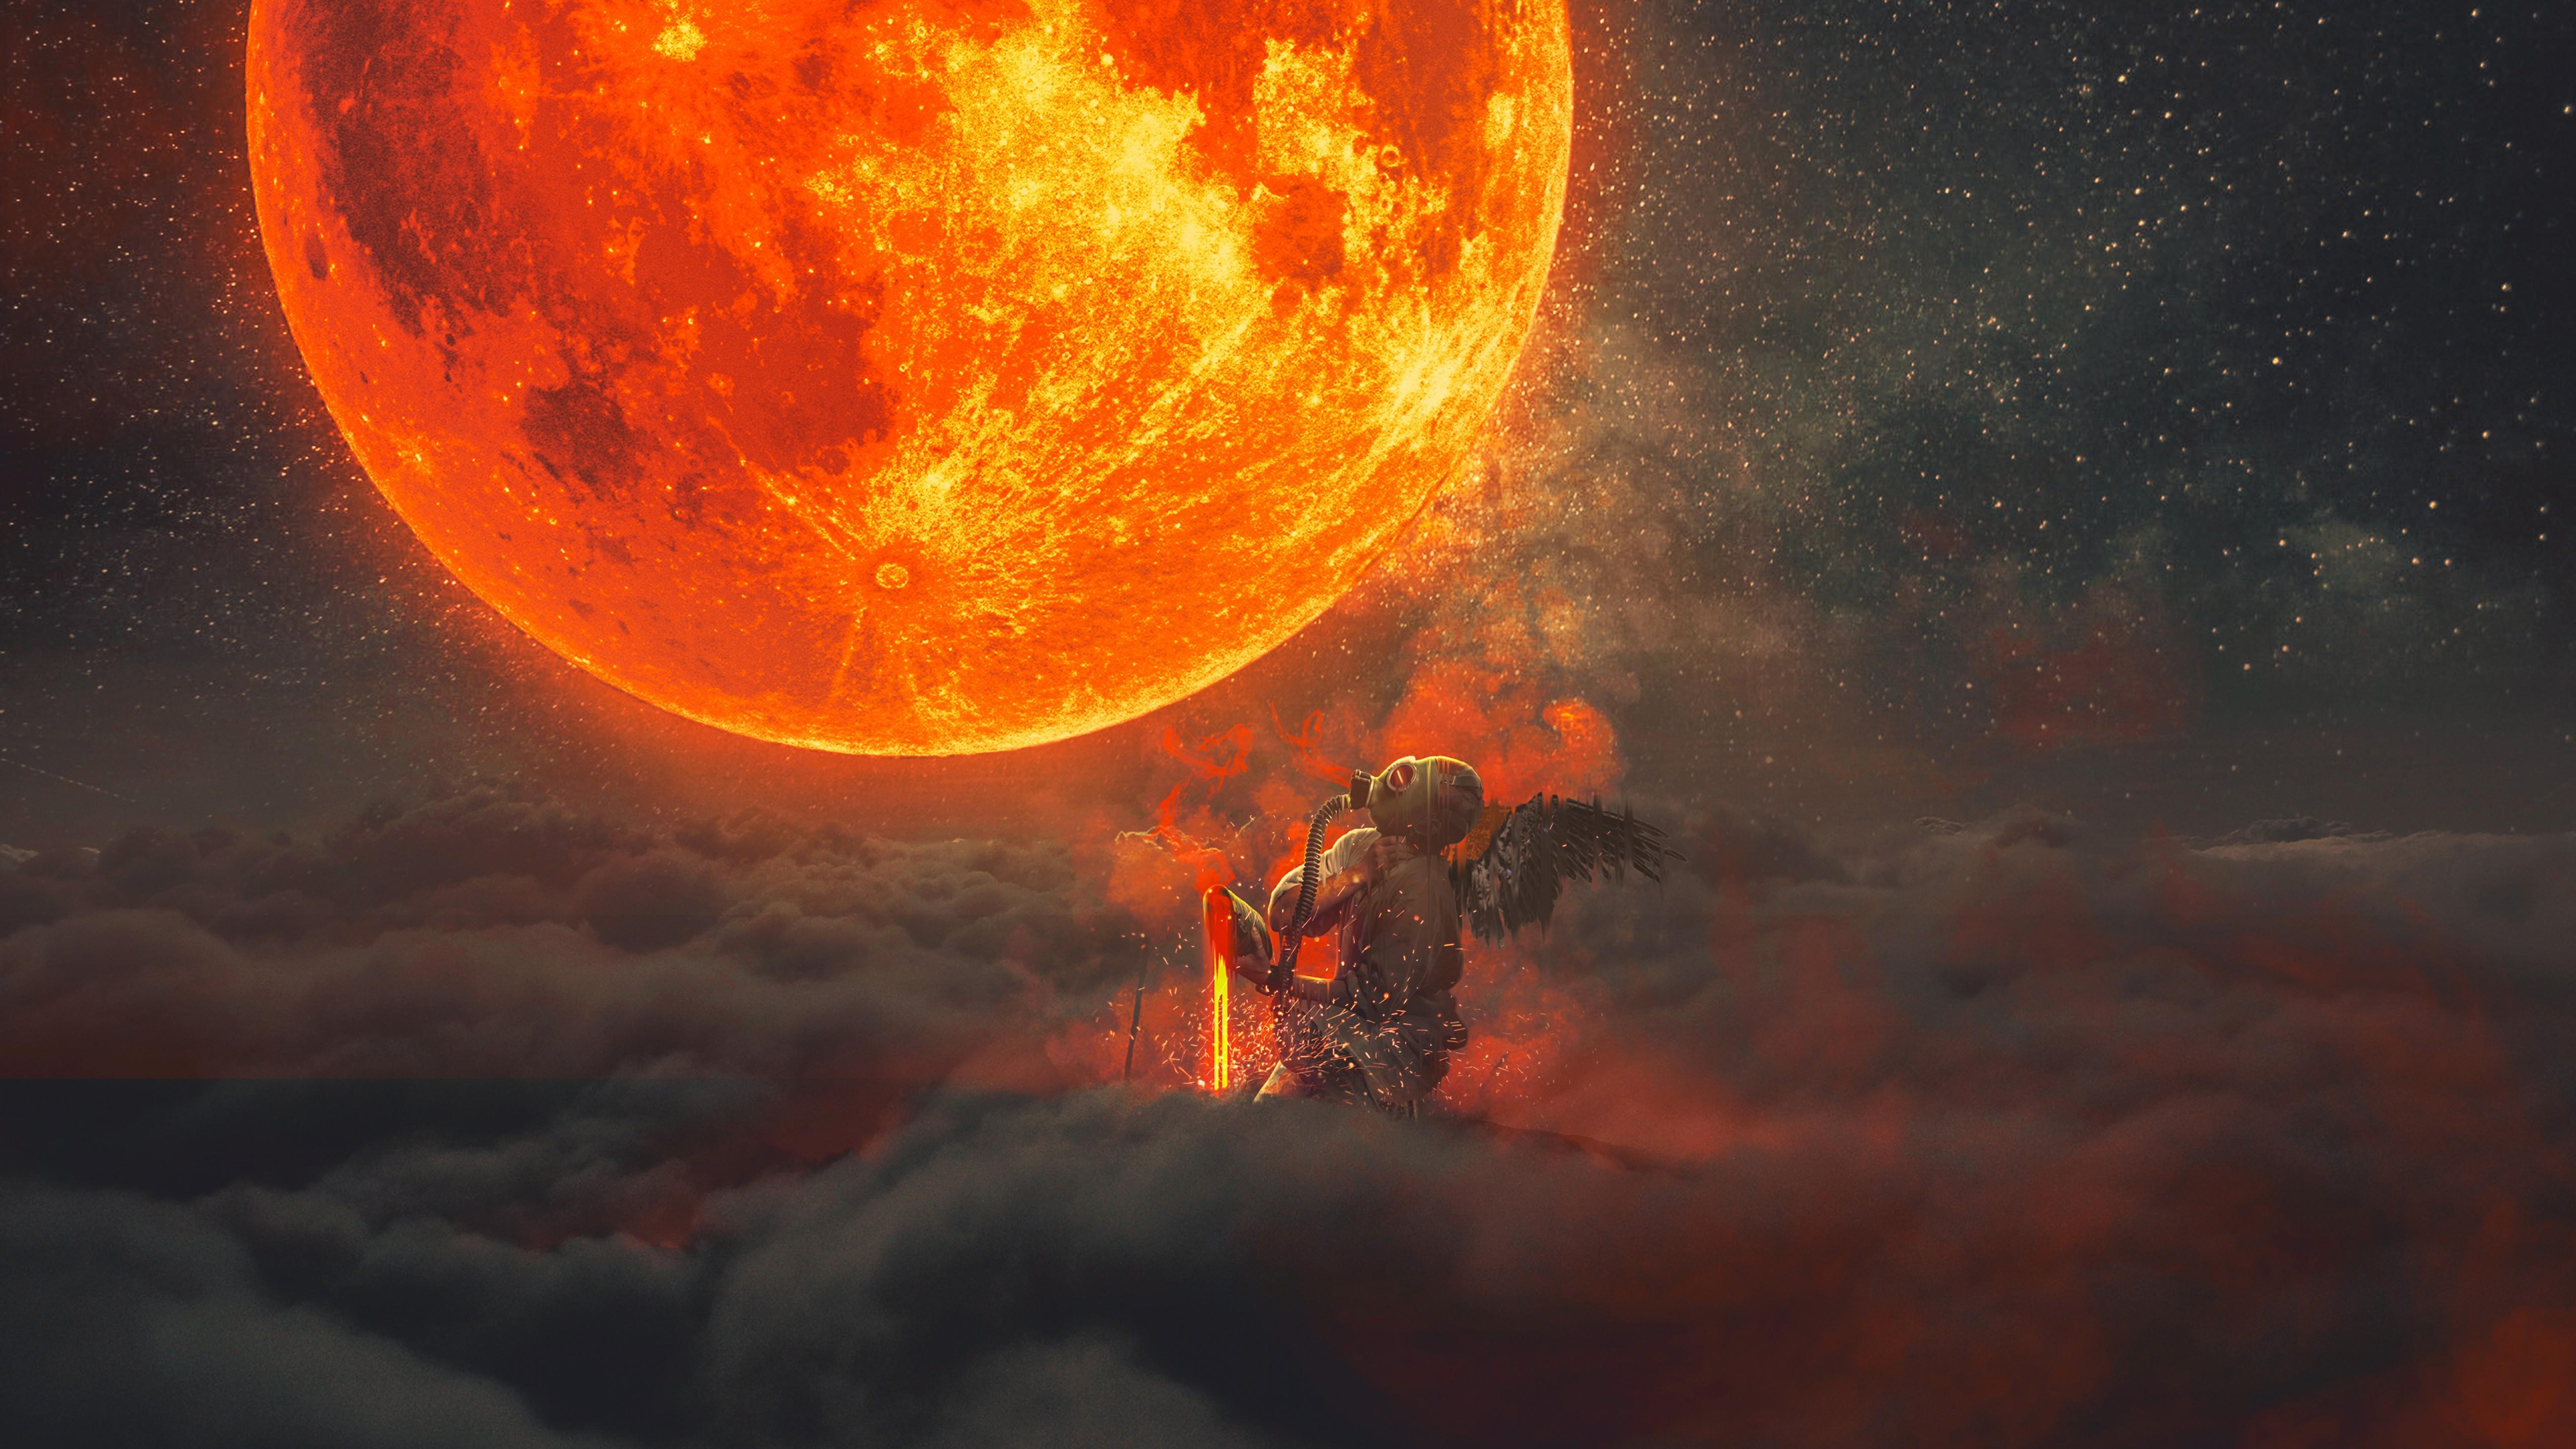 demon, Sun, Moon, clouds, fantasy art